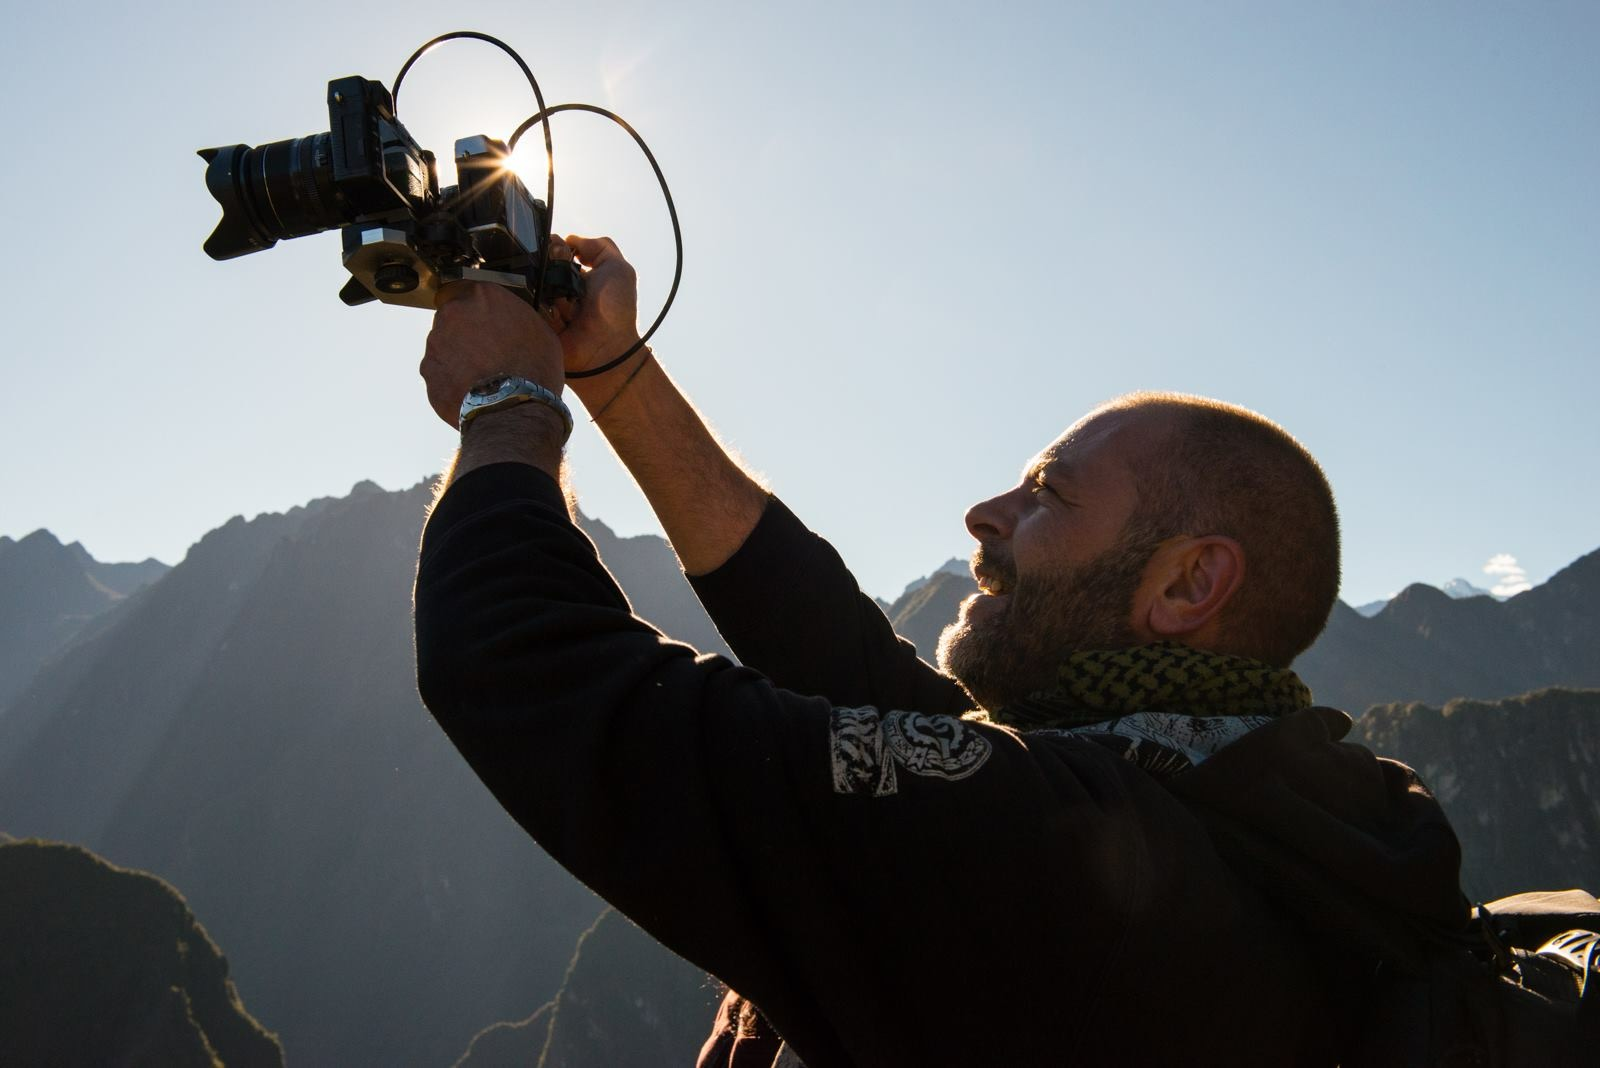 Antonio with his dual 3D camera setup.